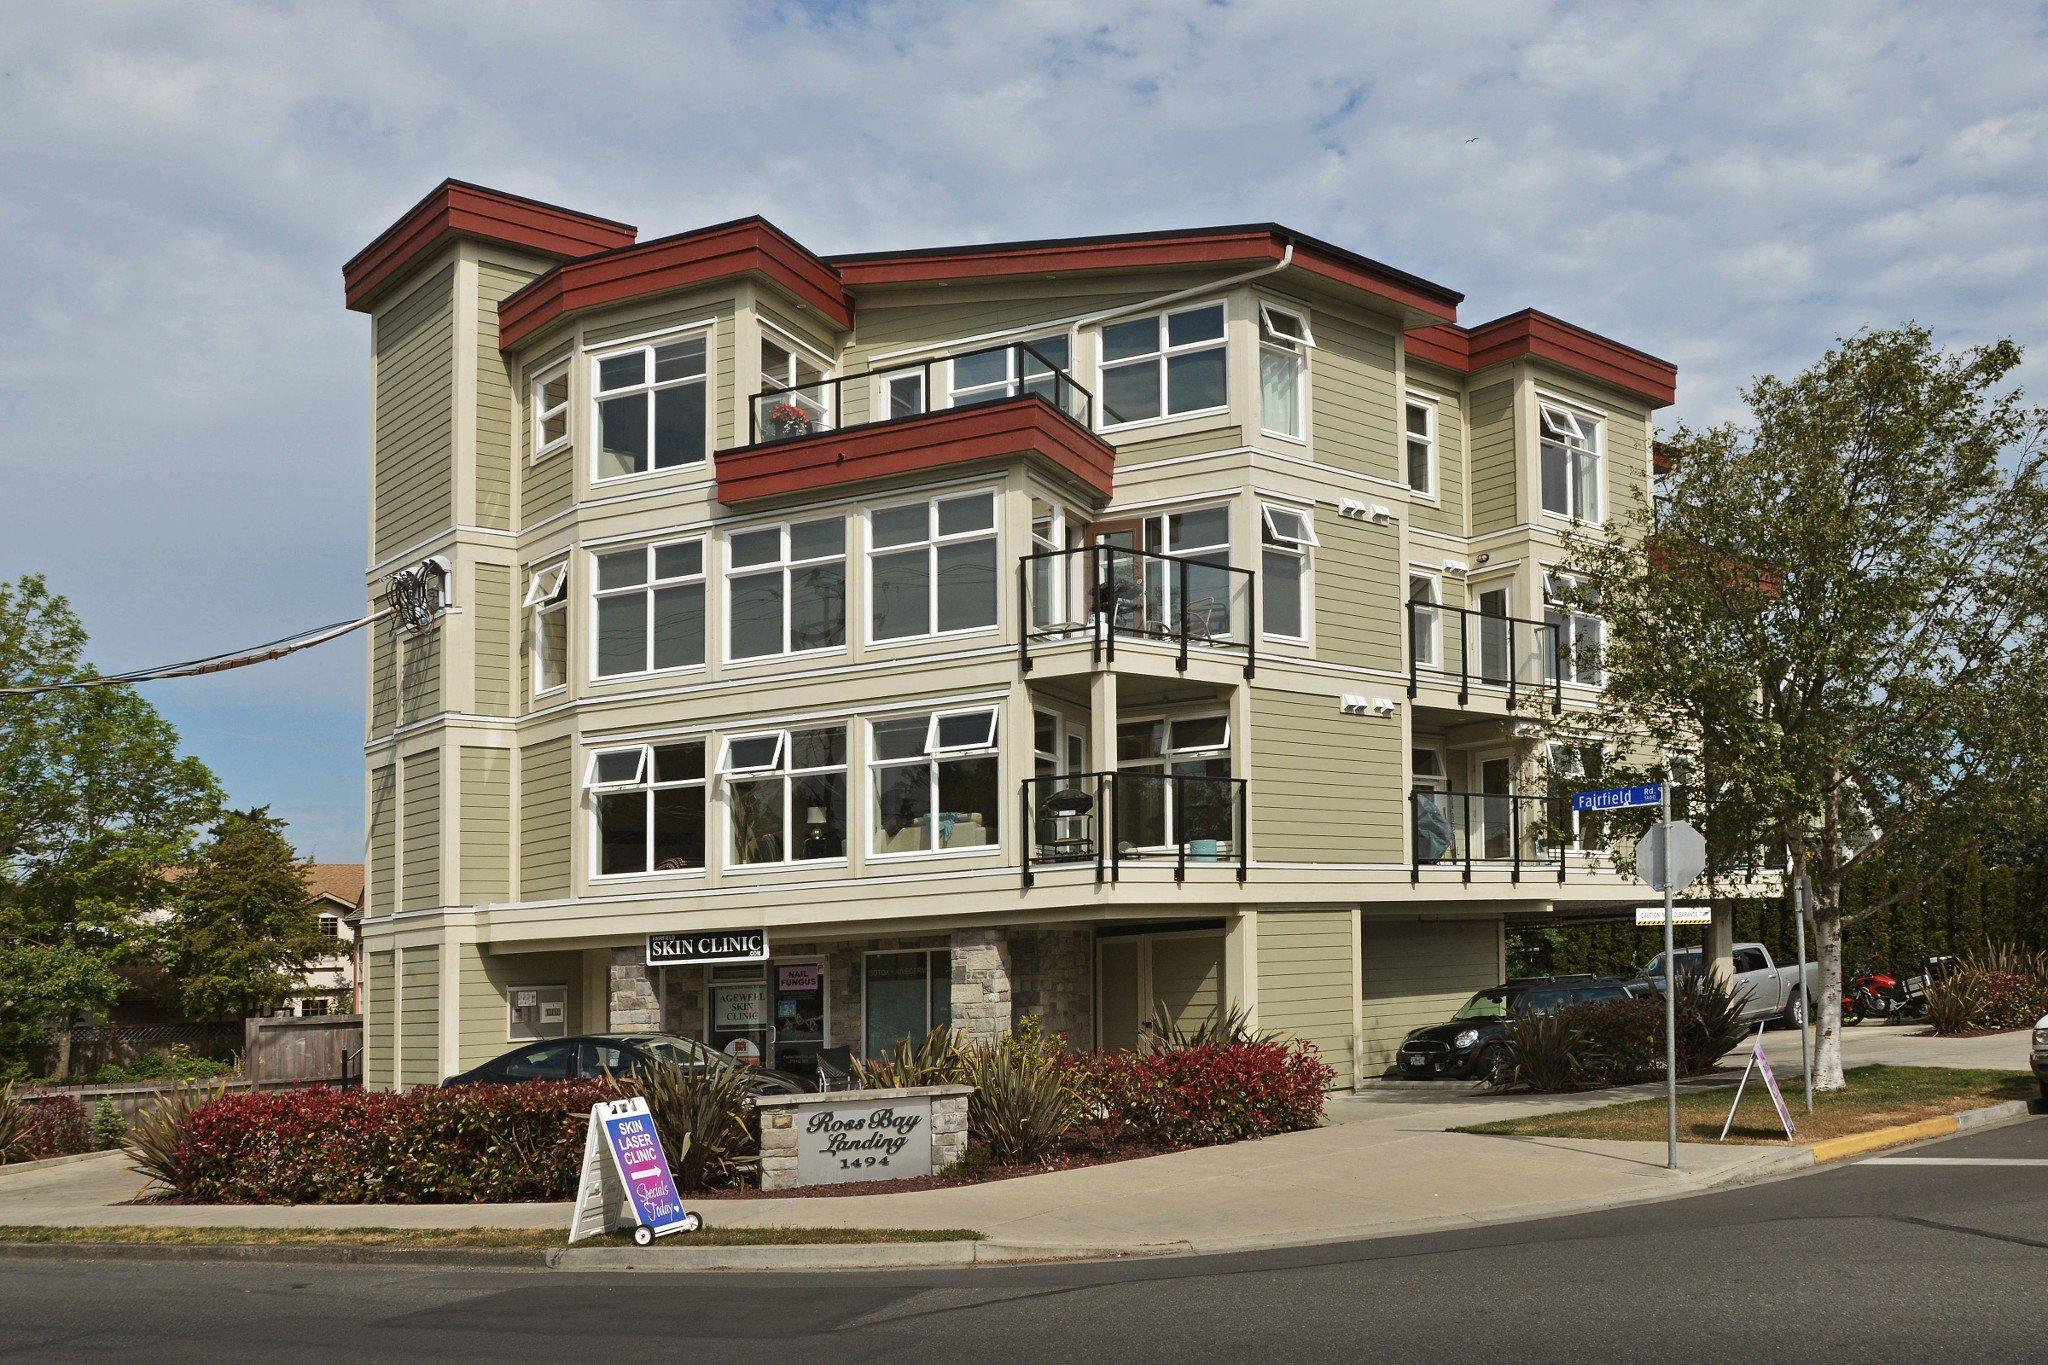 Main Photo: 301 1494 Fairfield Road in VICTORIA: Vi Fairfield West Condo Apartment for sale (Victoria)  : MLS®# 389023